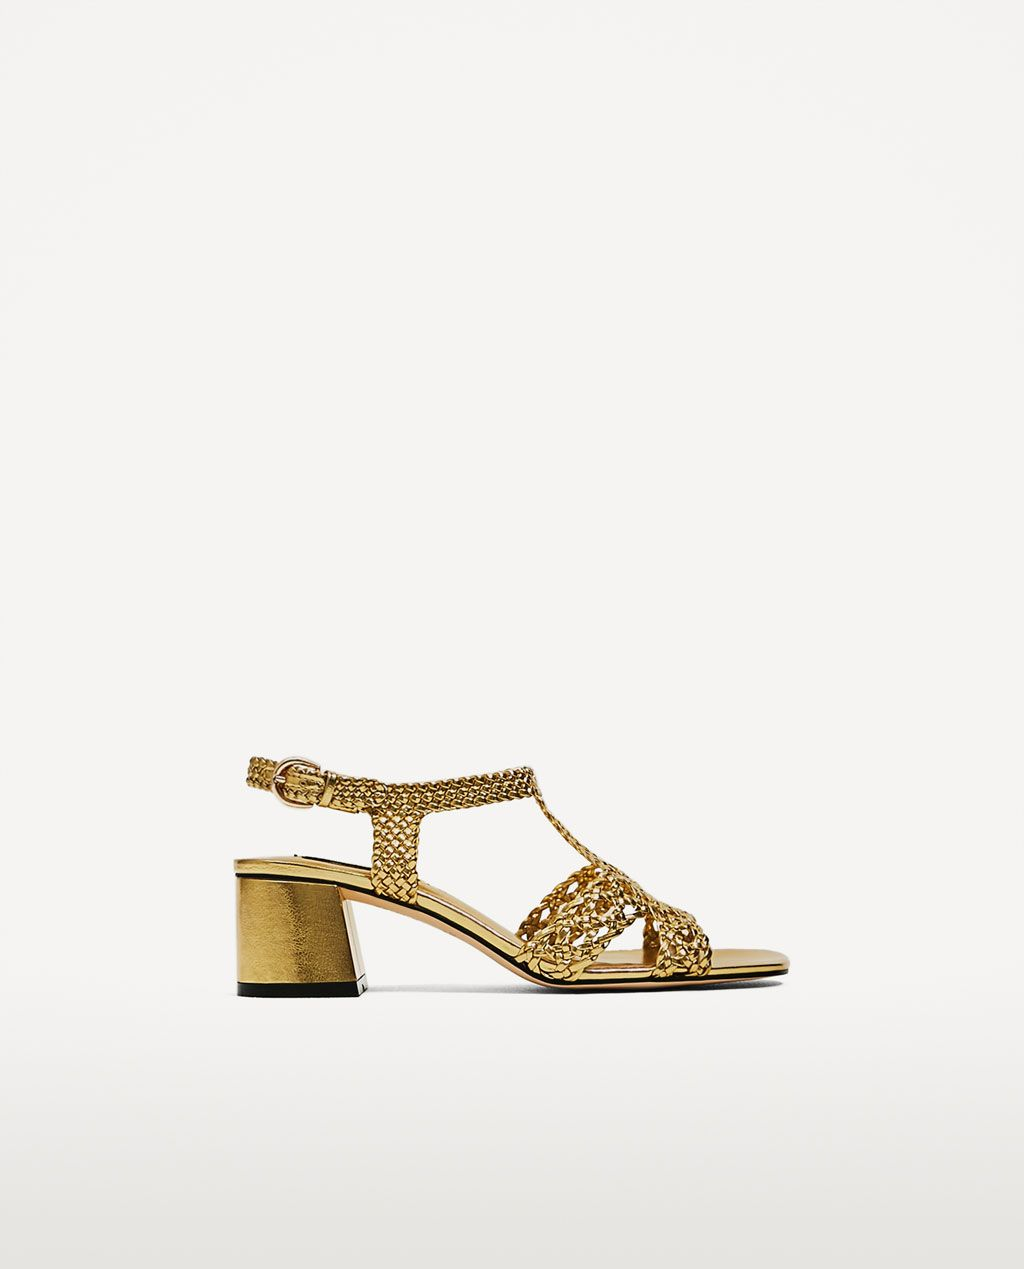 6b192aae042 Image 2 of GOLDEN BRAIDED HIGH HEEL SANDALS from Zara | sp / summer ...